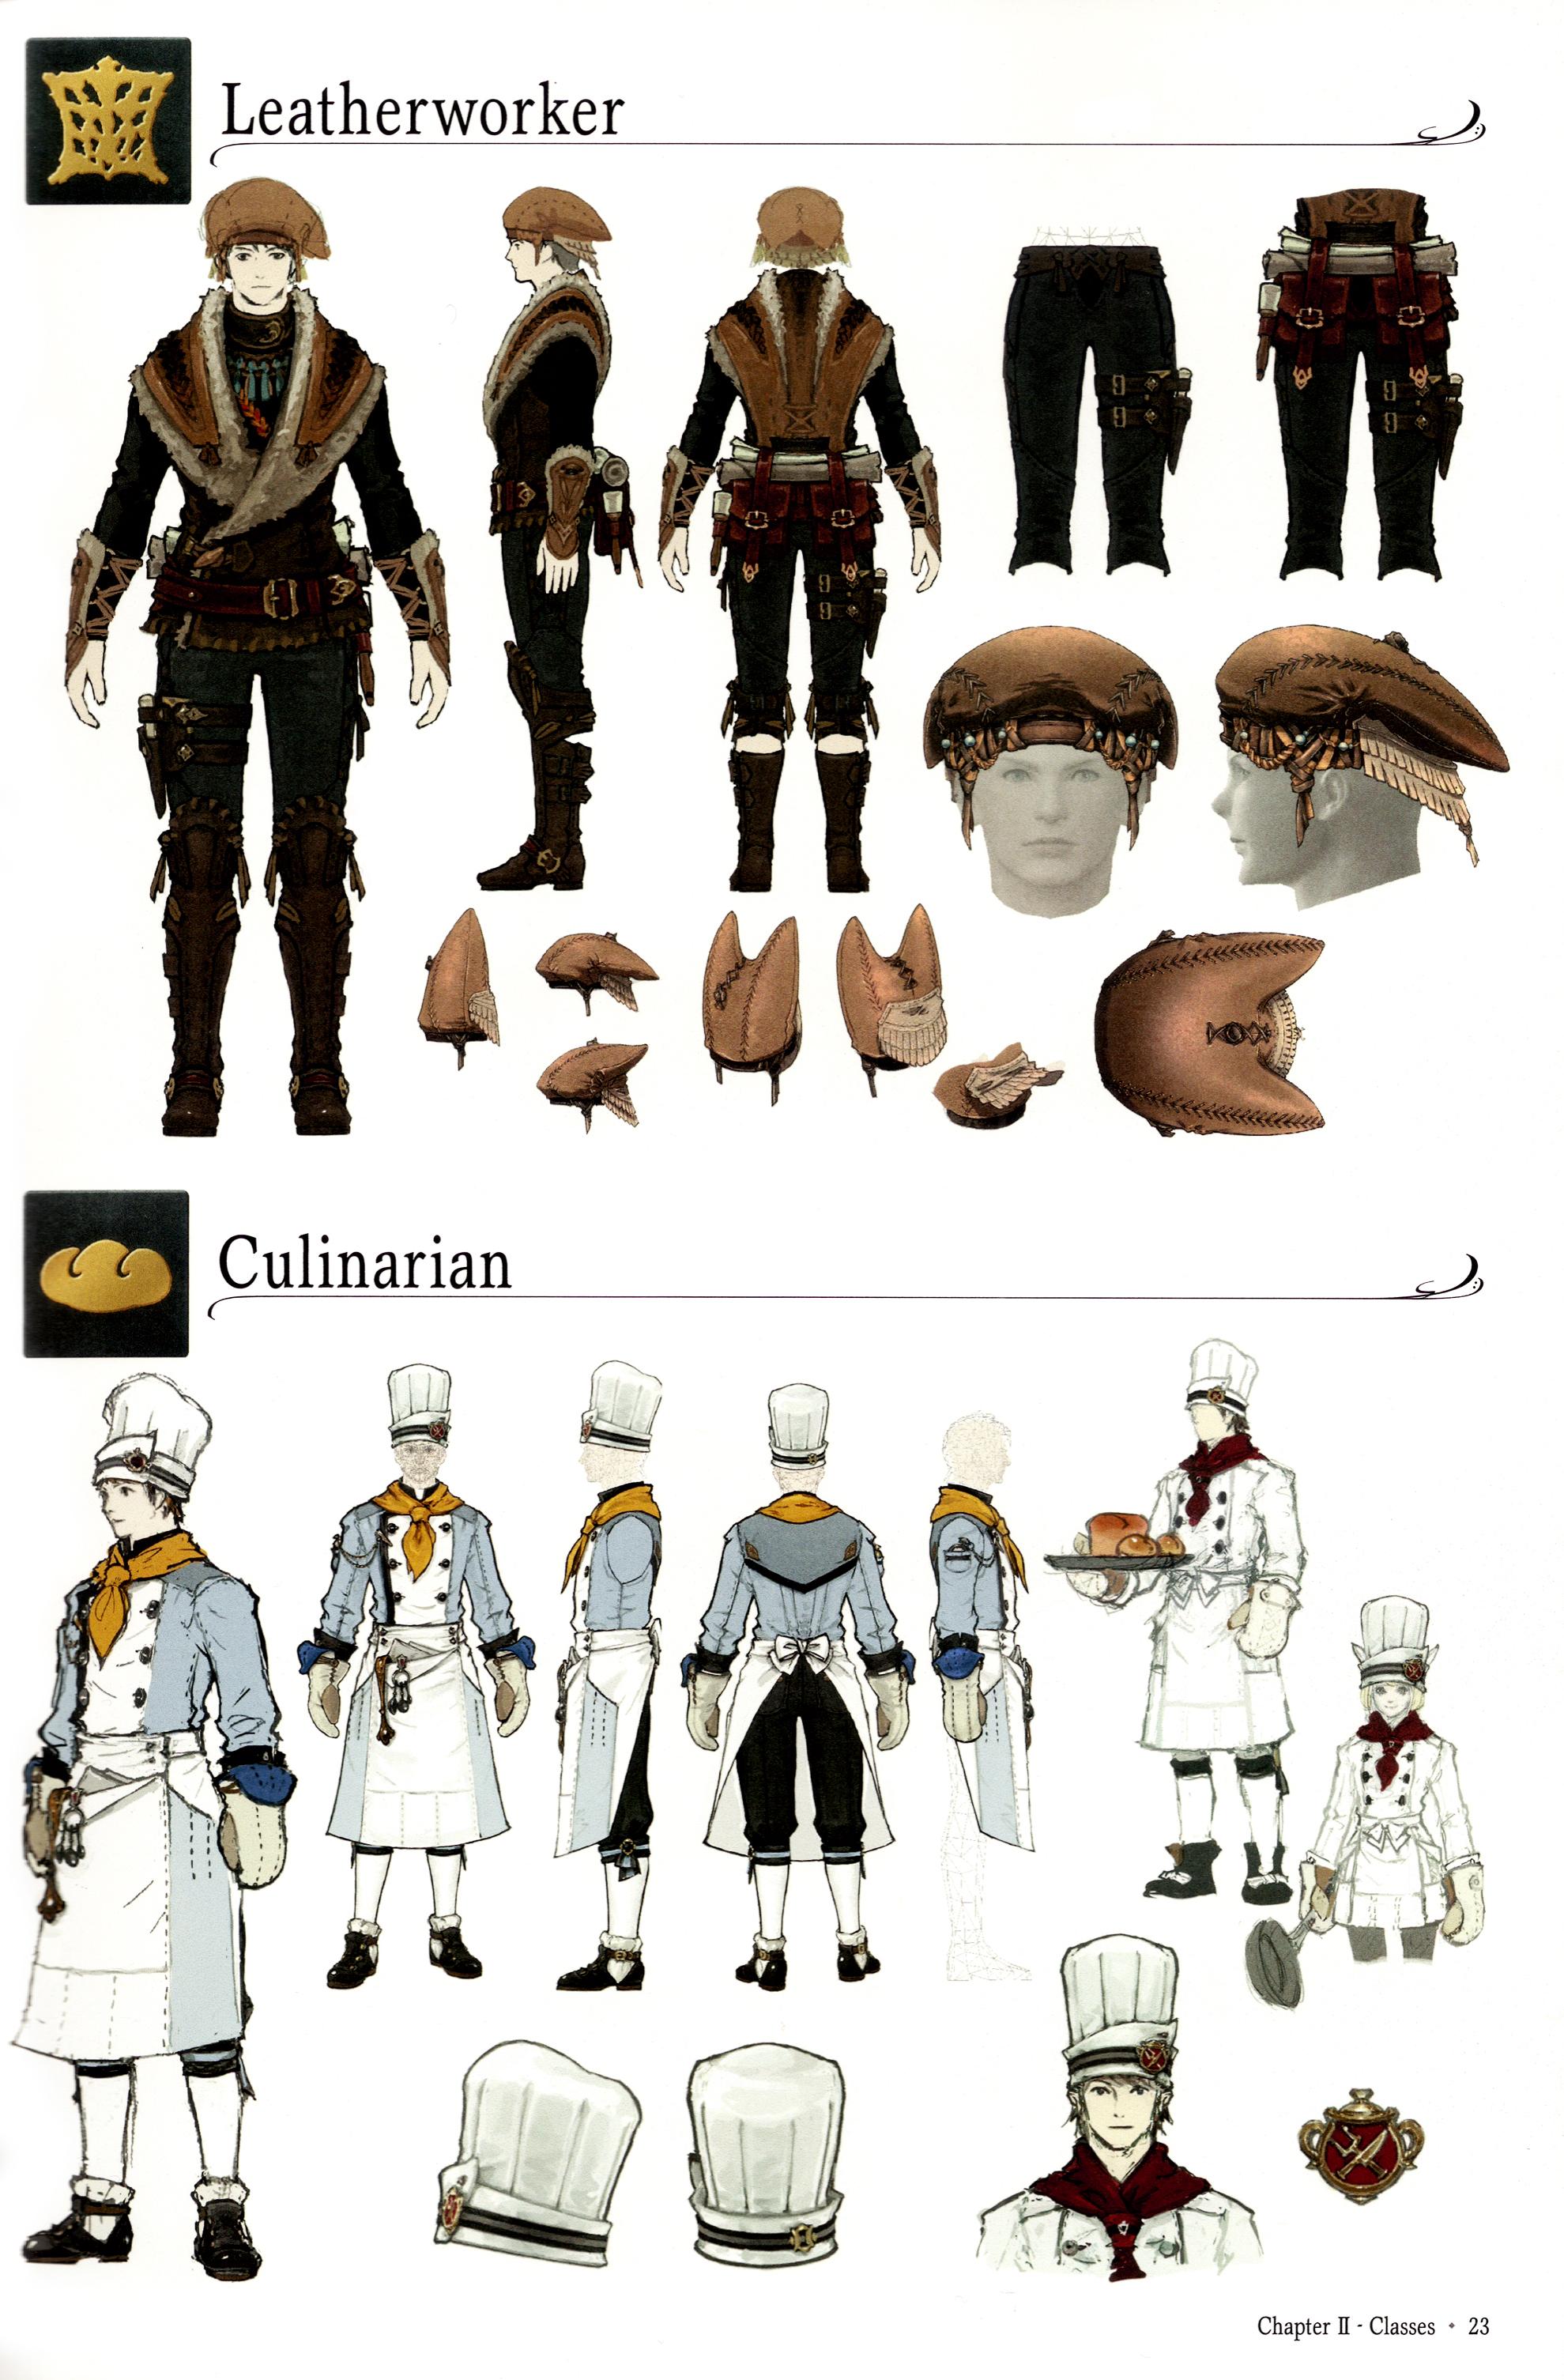 Final Fantasy Xiv Leatherworker Culinarian Classes Minitokyo